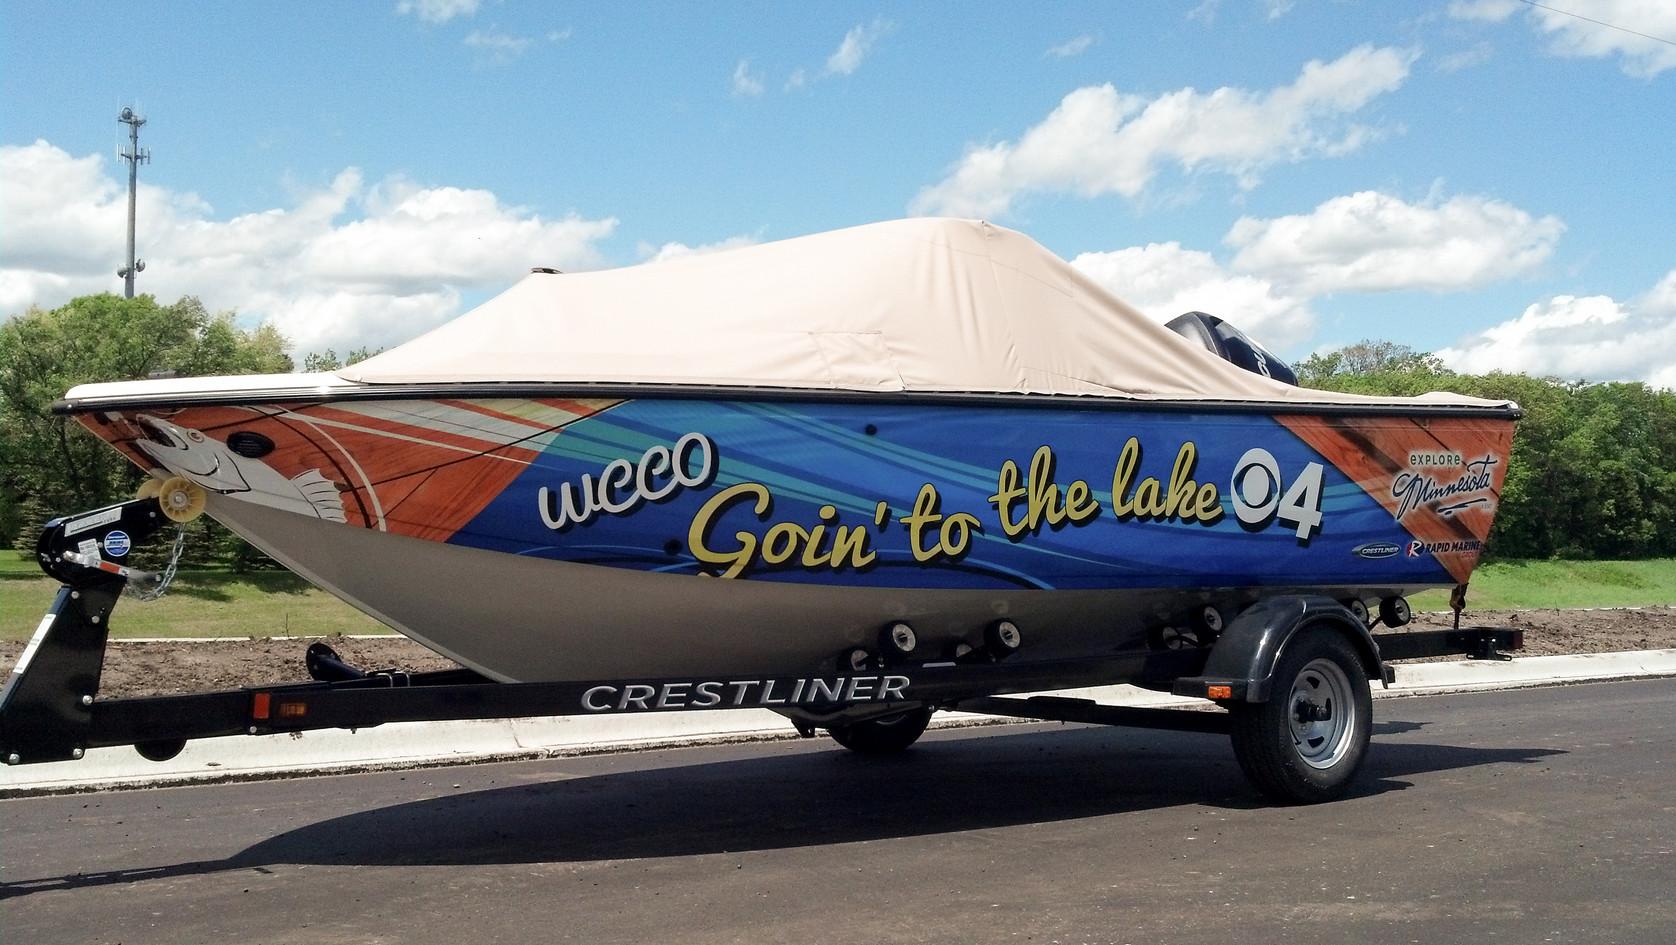 Full WCCO Boat Wrap